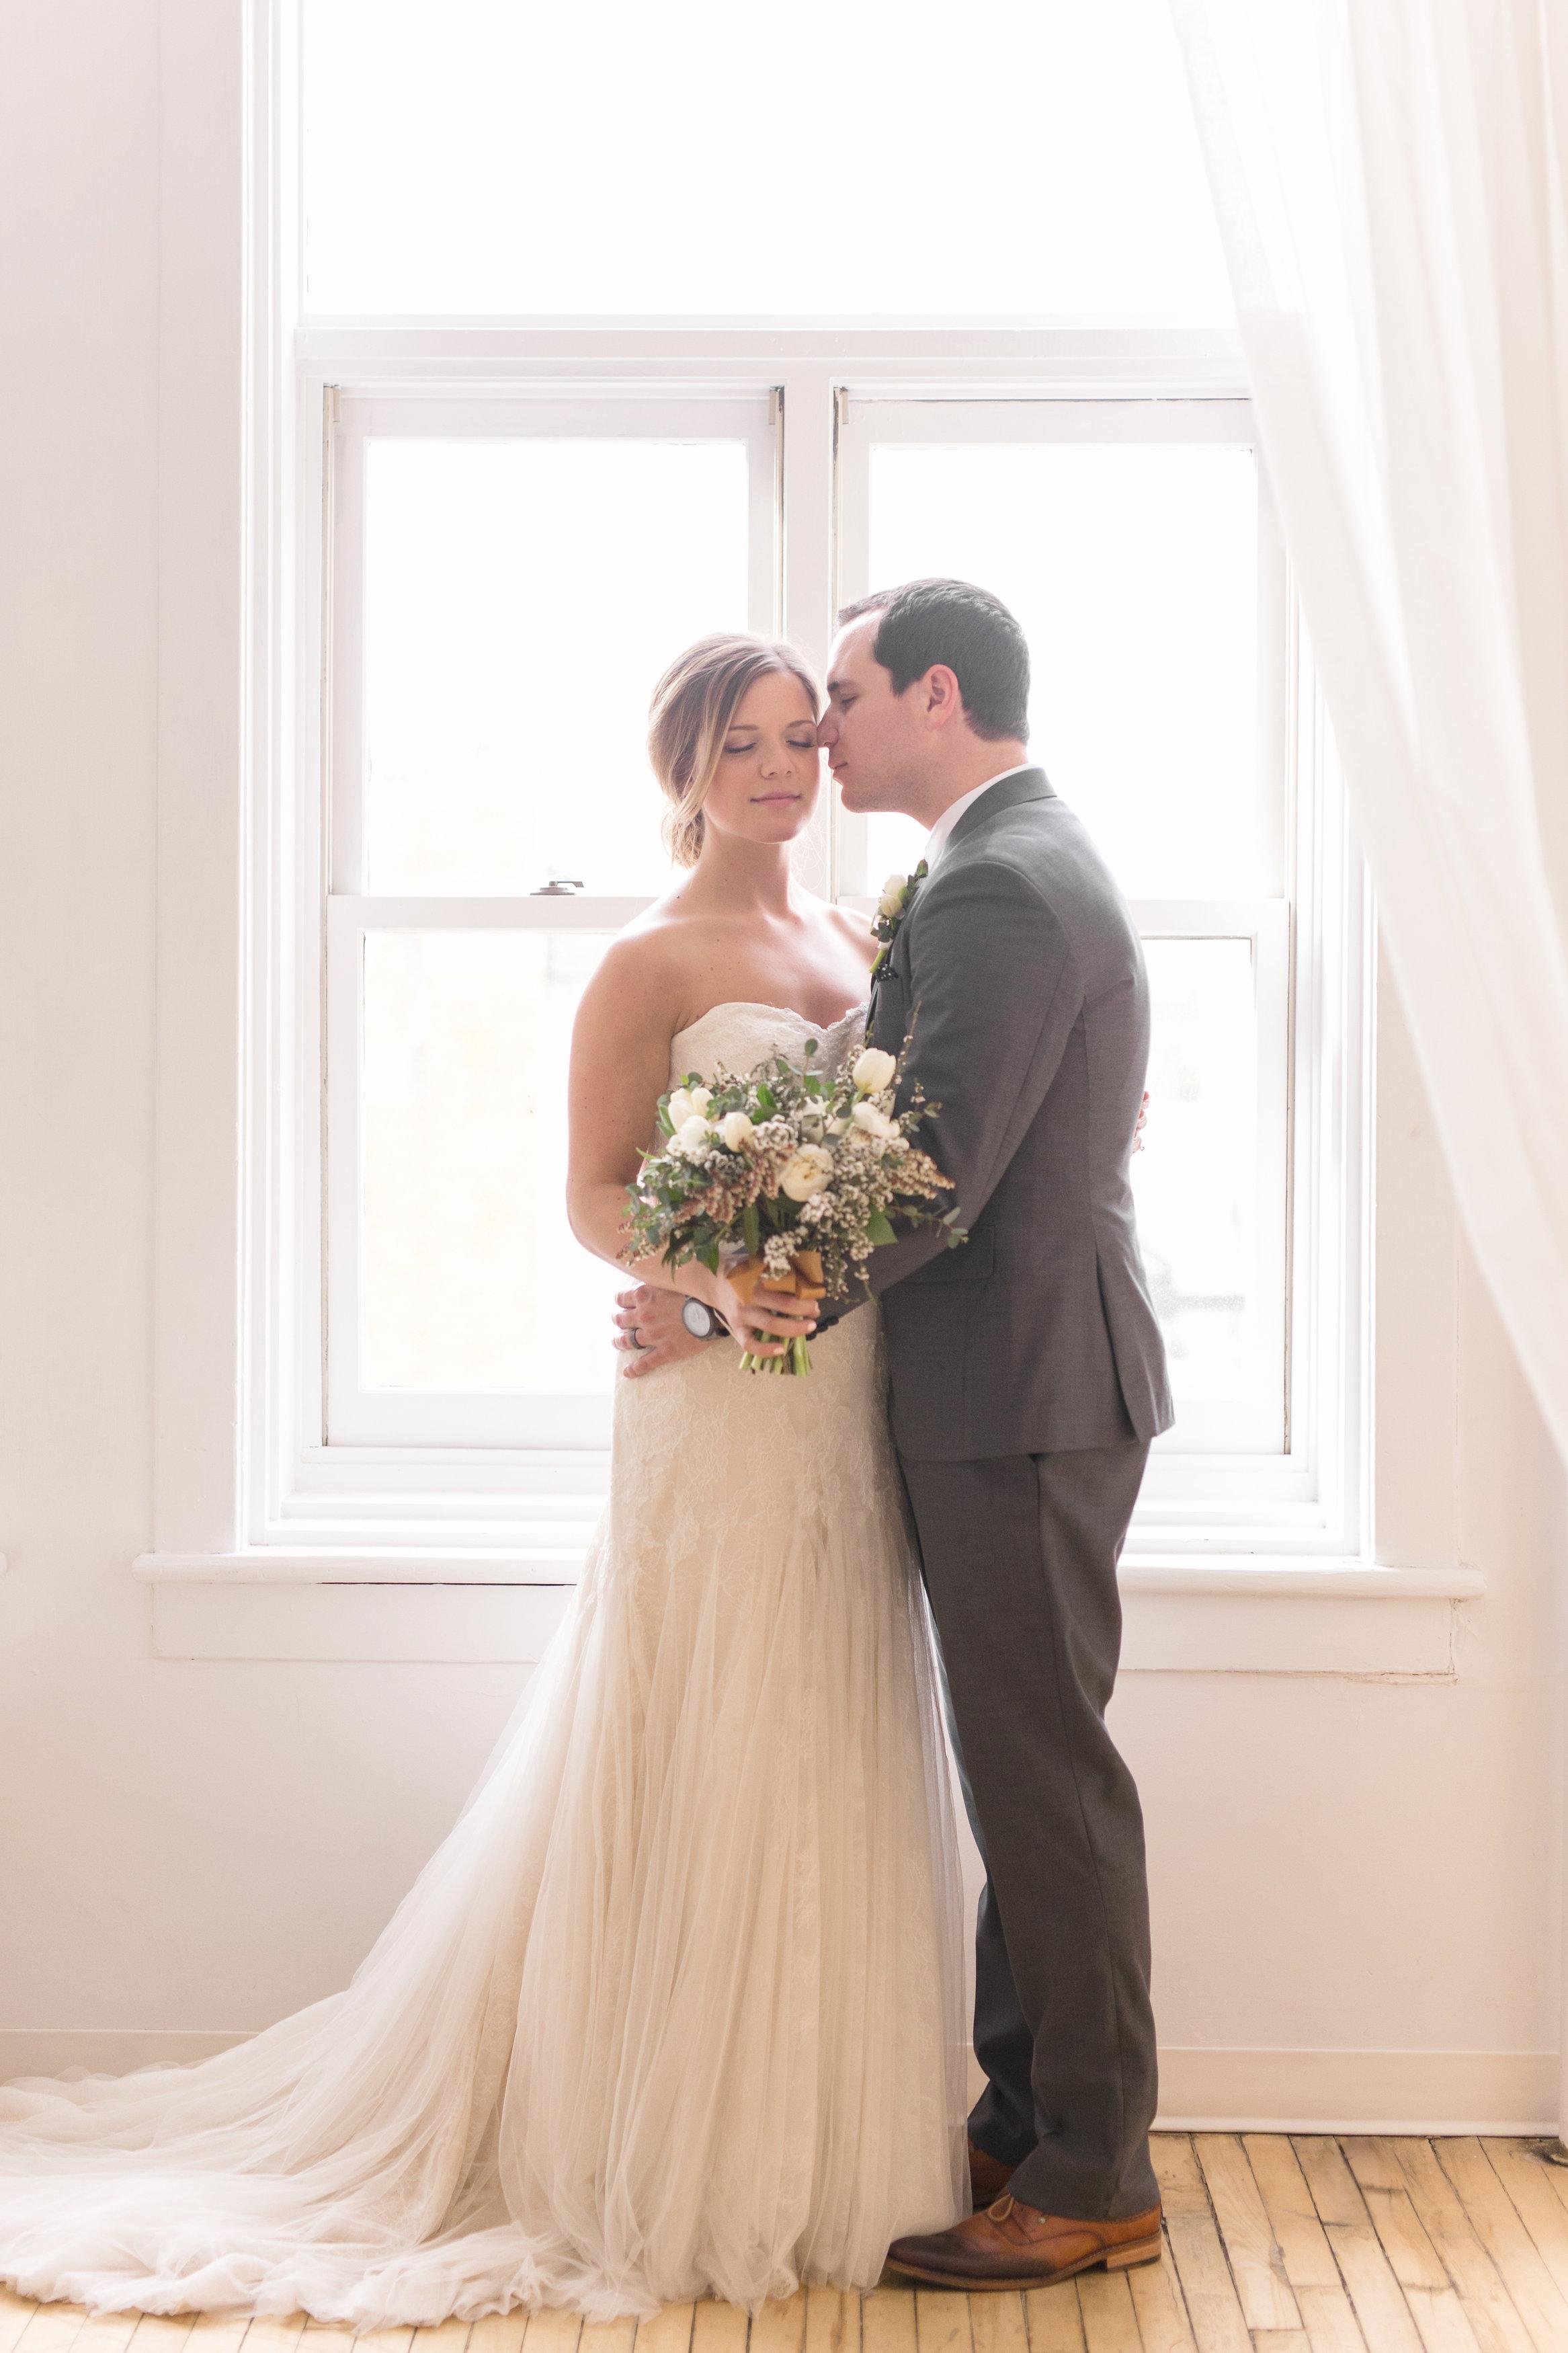 Indoor Wedding Photos Winnipeg - Weddings in Winnipeg